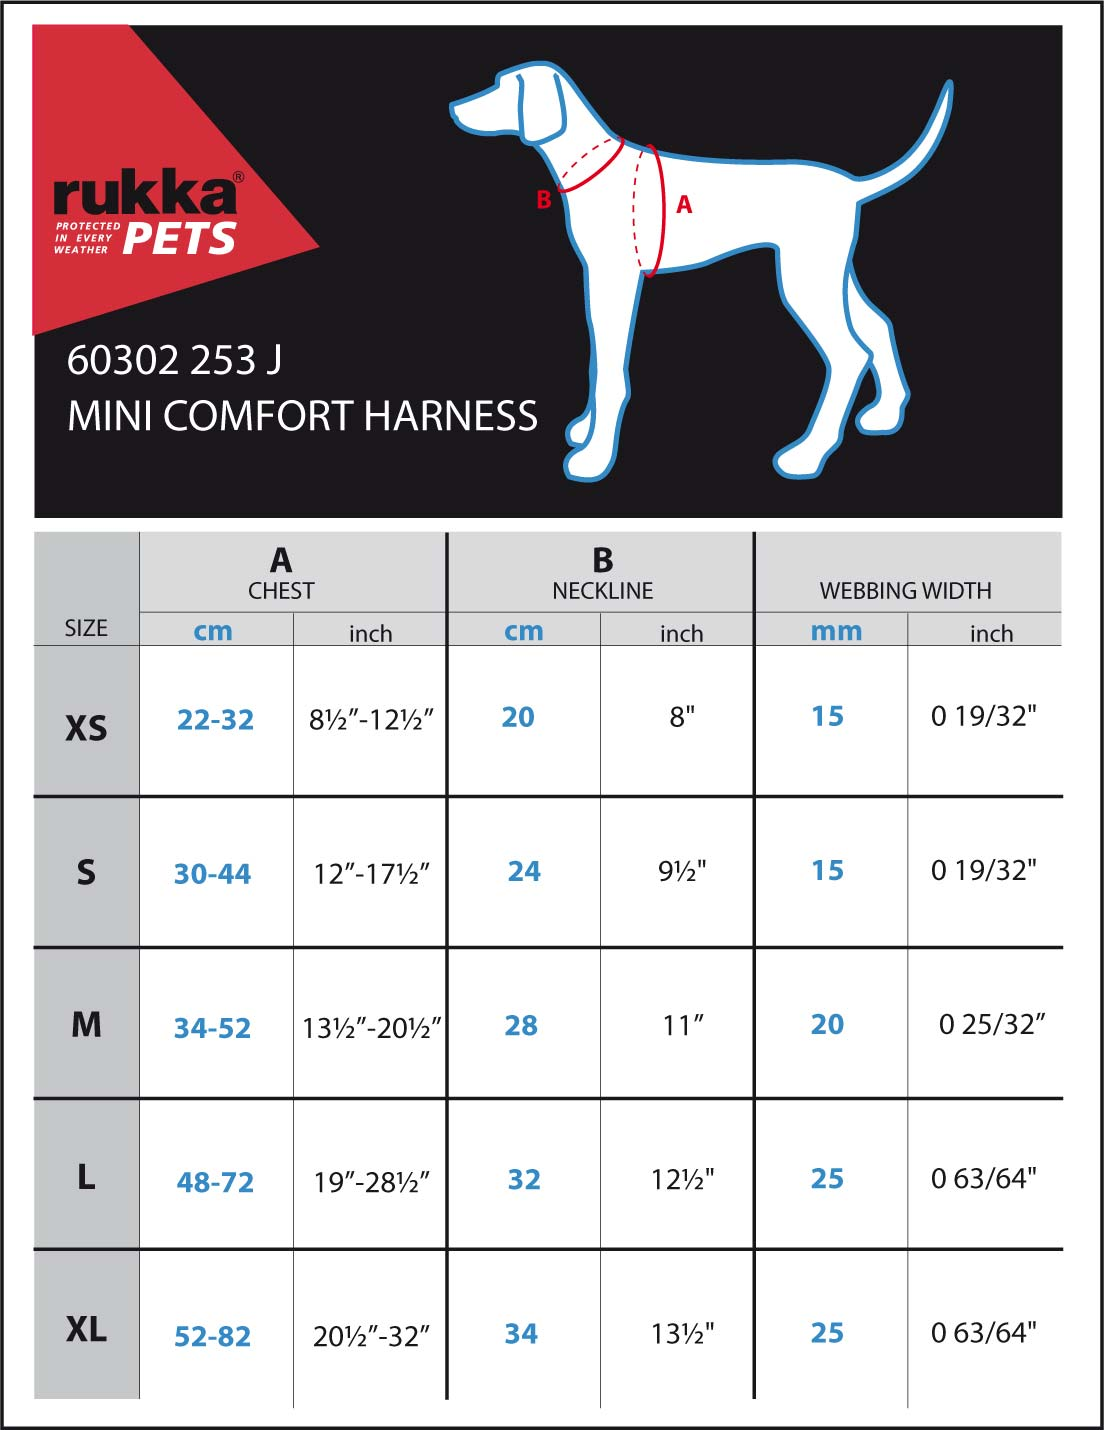 MINI-COMFORT-HARNESS-SIZE-CHART